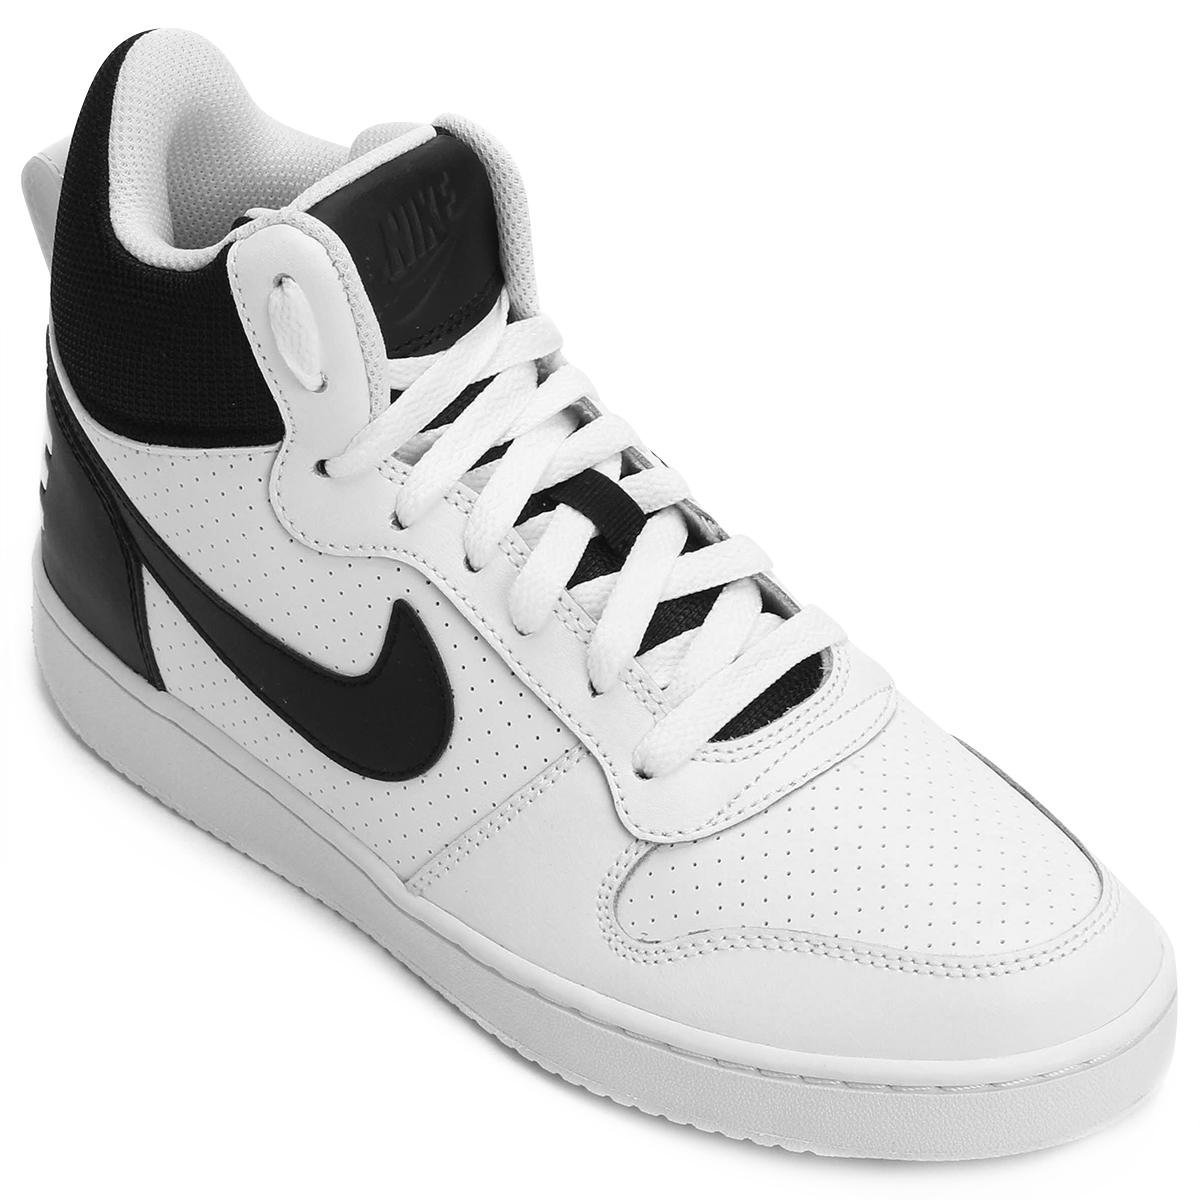 e41f424ec2d266 Tênis Couro Cano Alto Nike Recreation Mid Masculino - Compre Agora ...